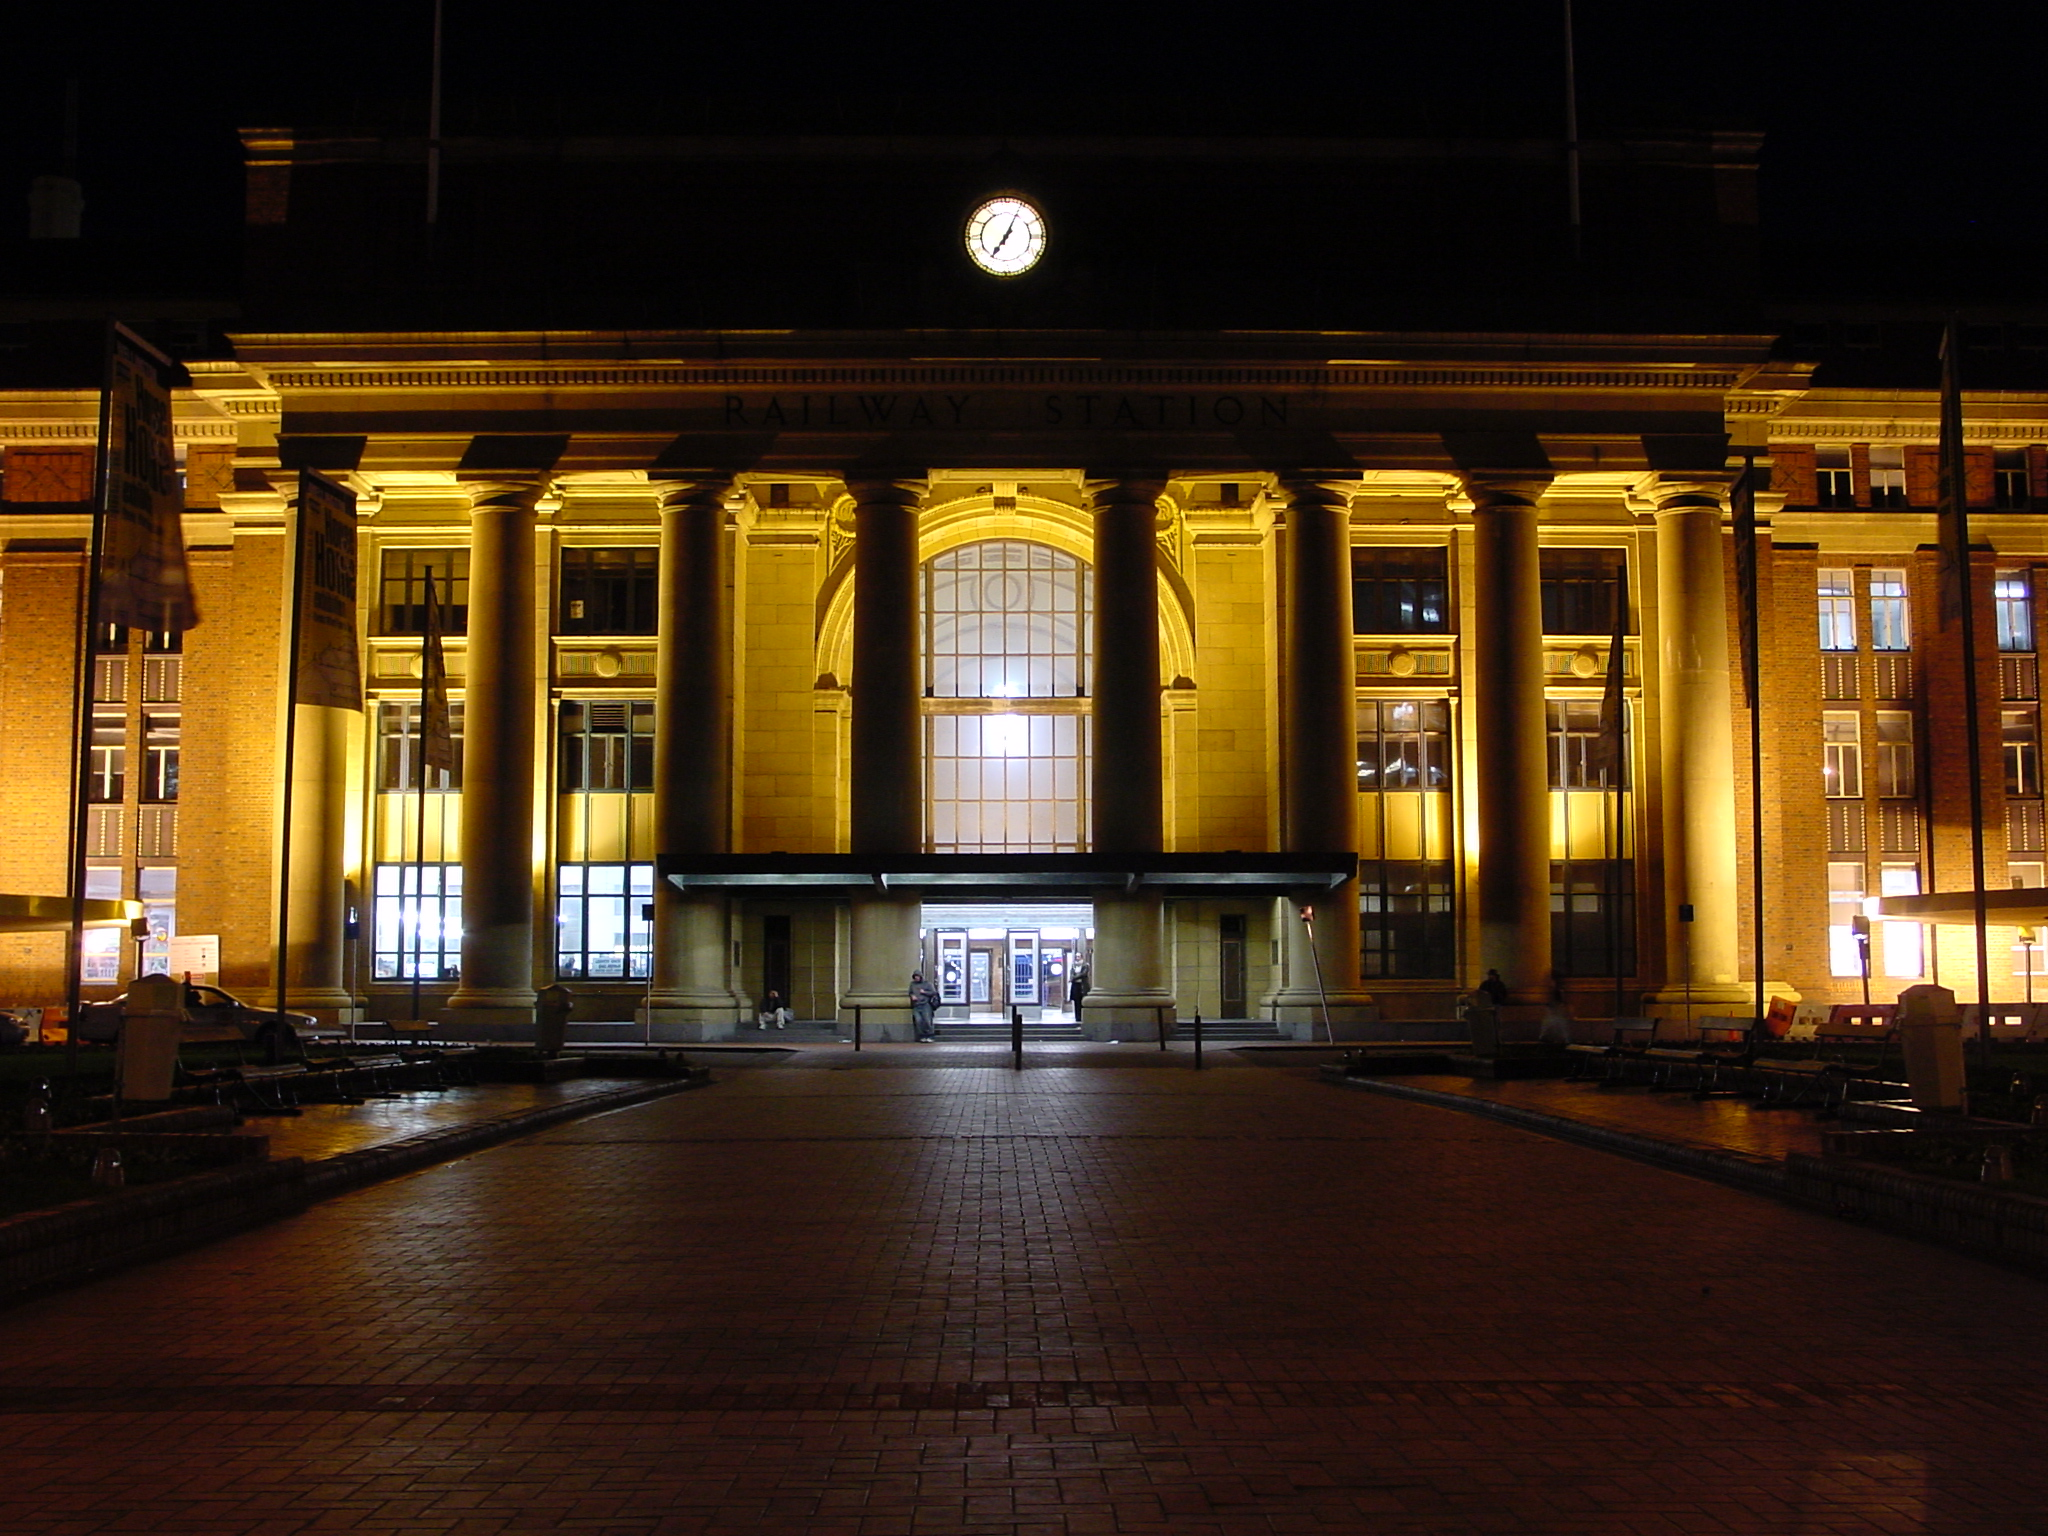 Wellington railway station - Wikipedia